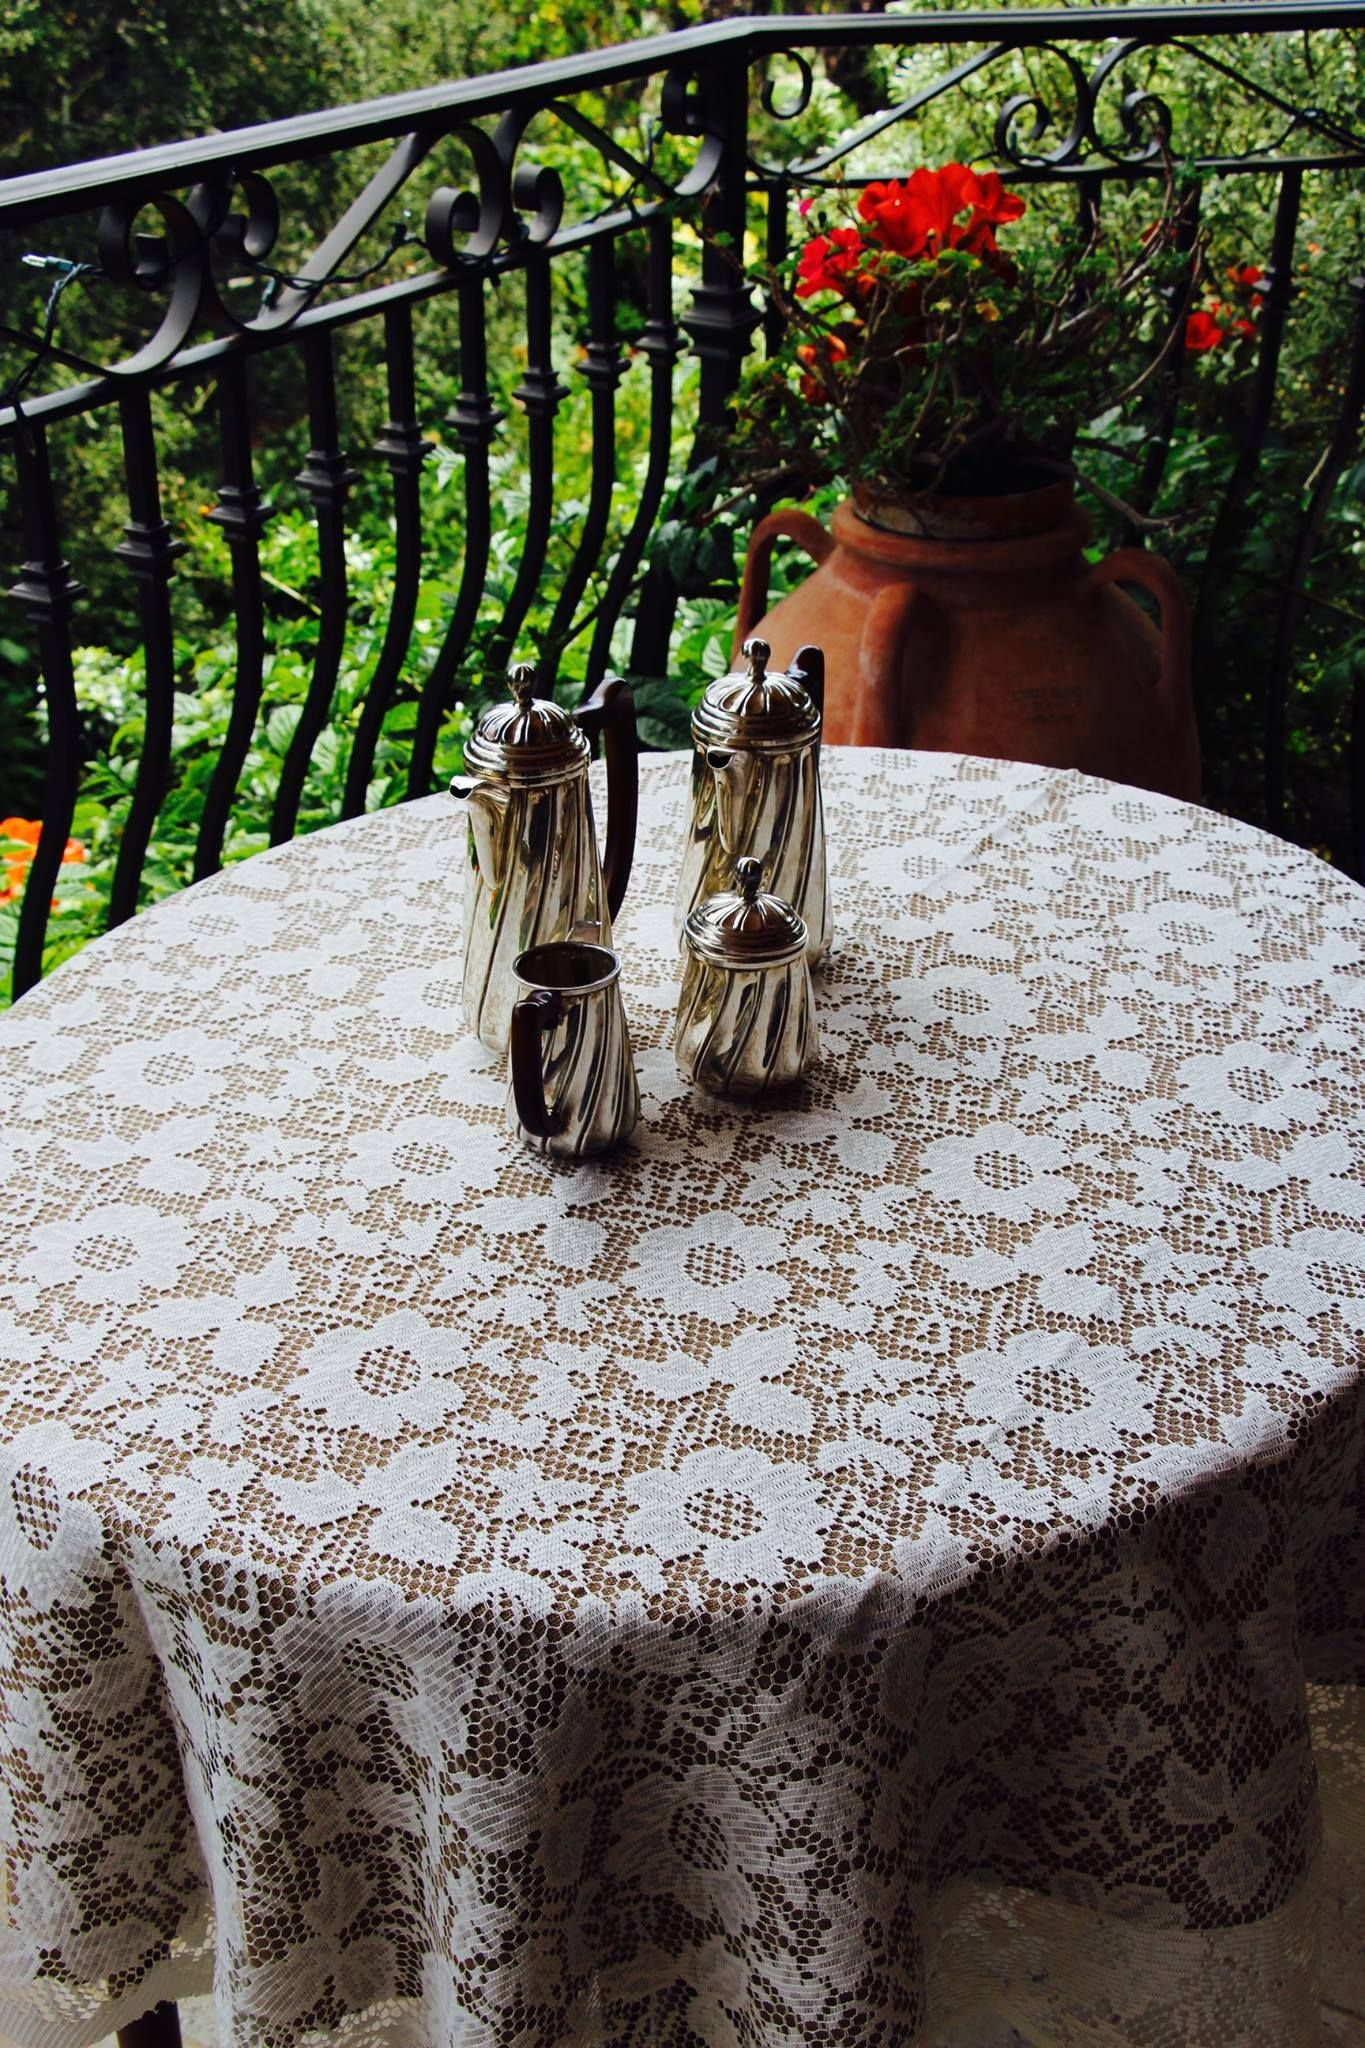 Medium Crop Of Premier Table Linens